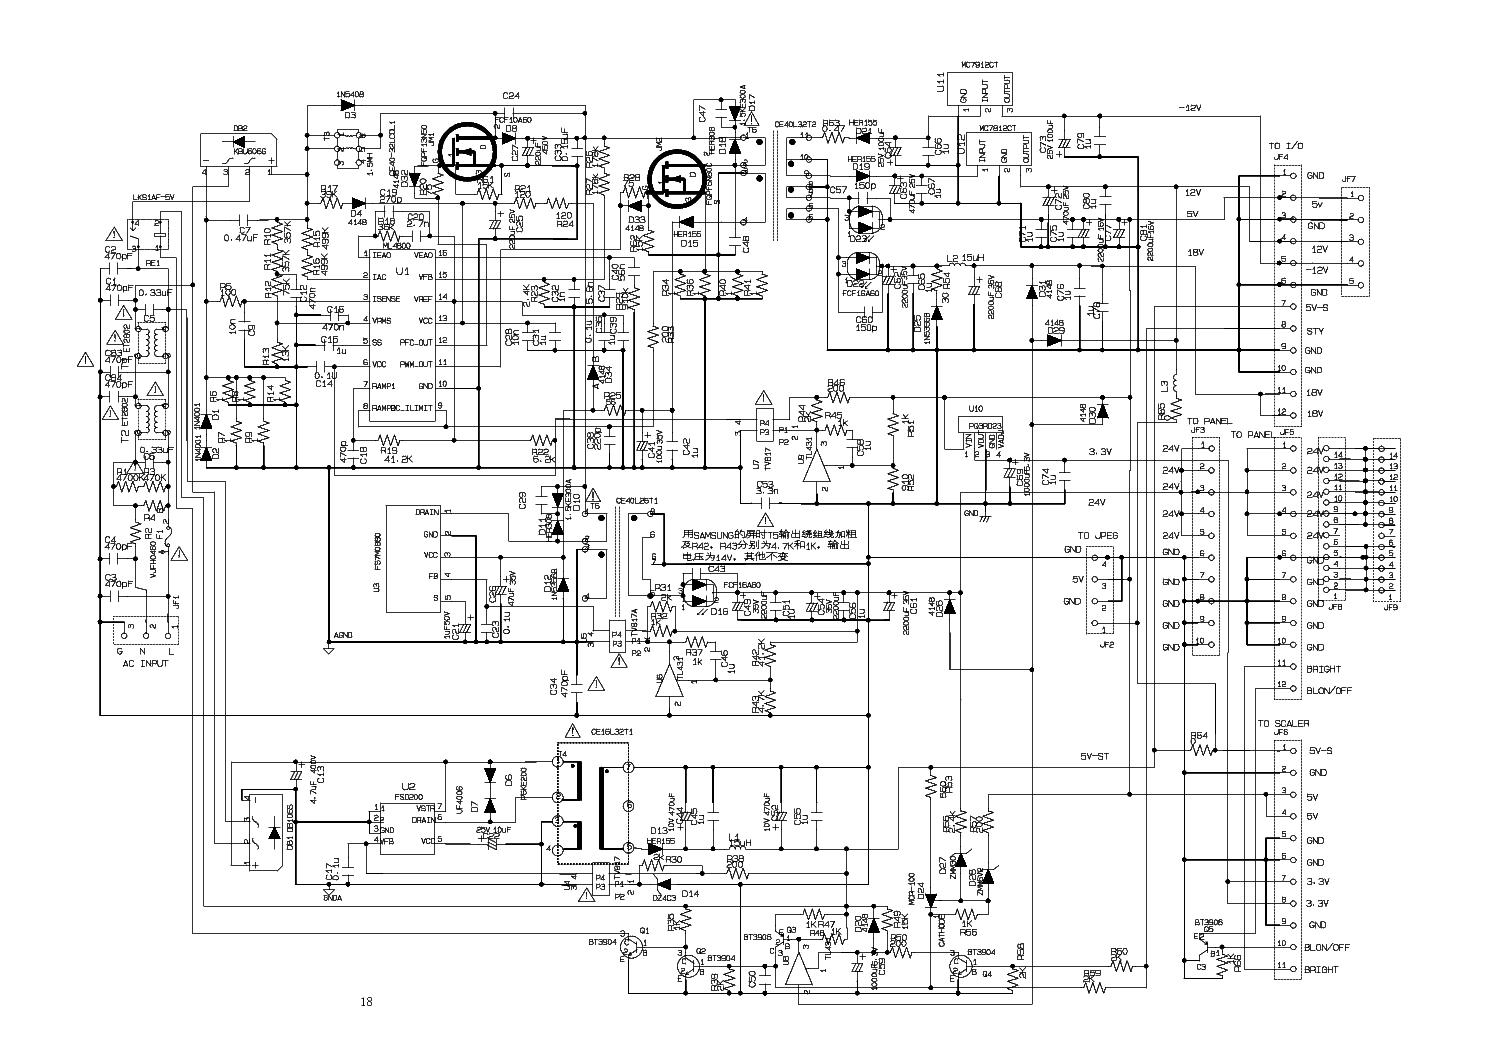 conrad fkv7 827 226hb1 power supply sch service manual download  schematics  eeprom  repair info